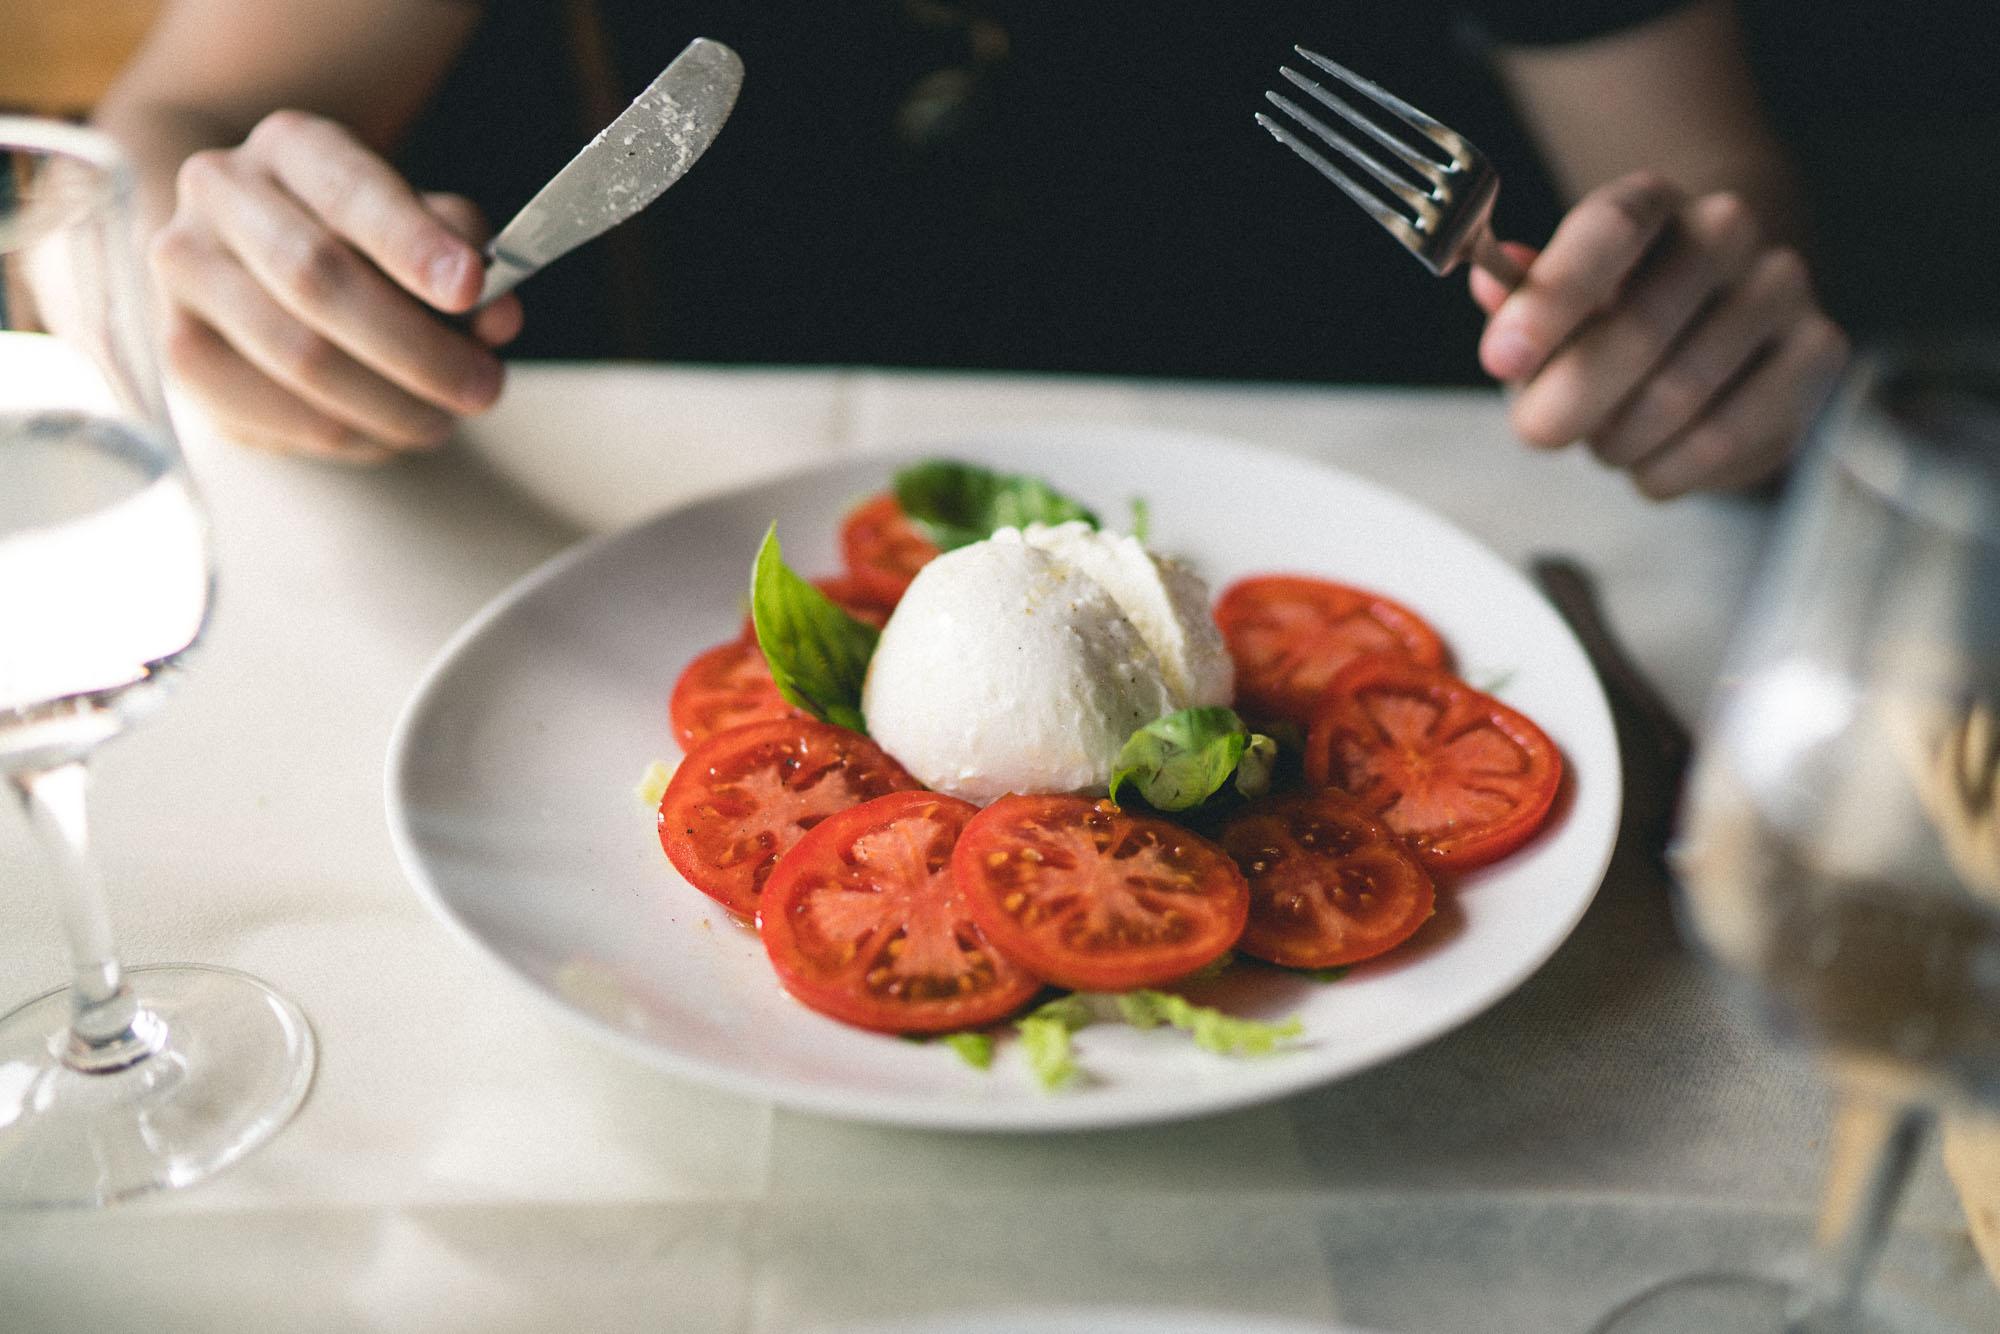 Fresh buffalo mozzarella and tomatoes in southern Tuscany, Italy